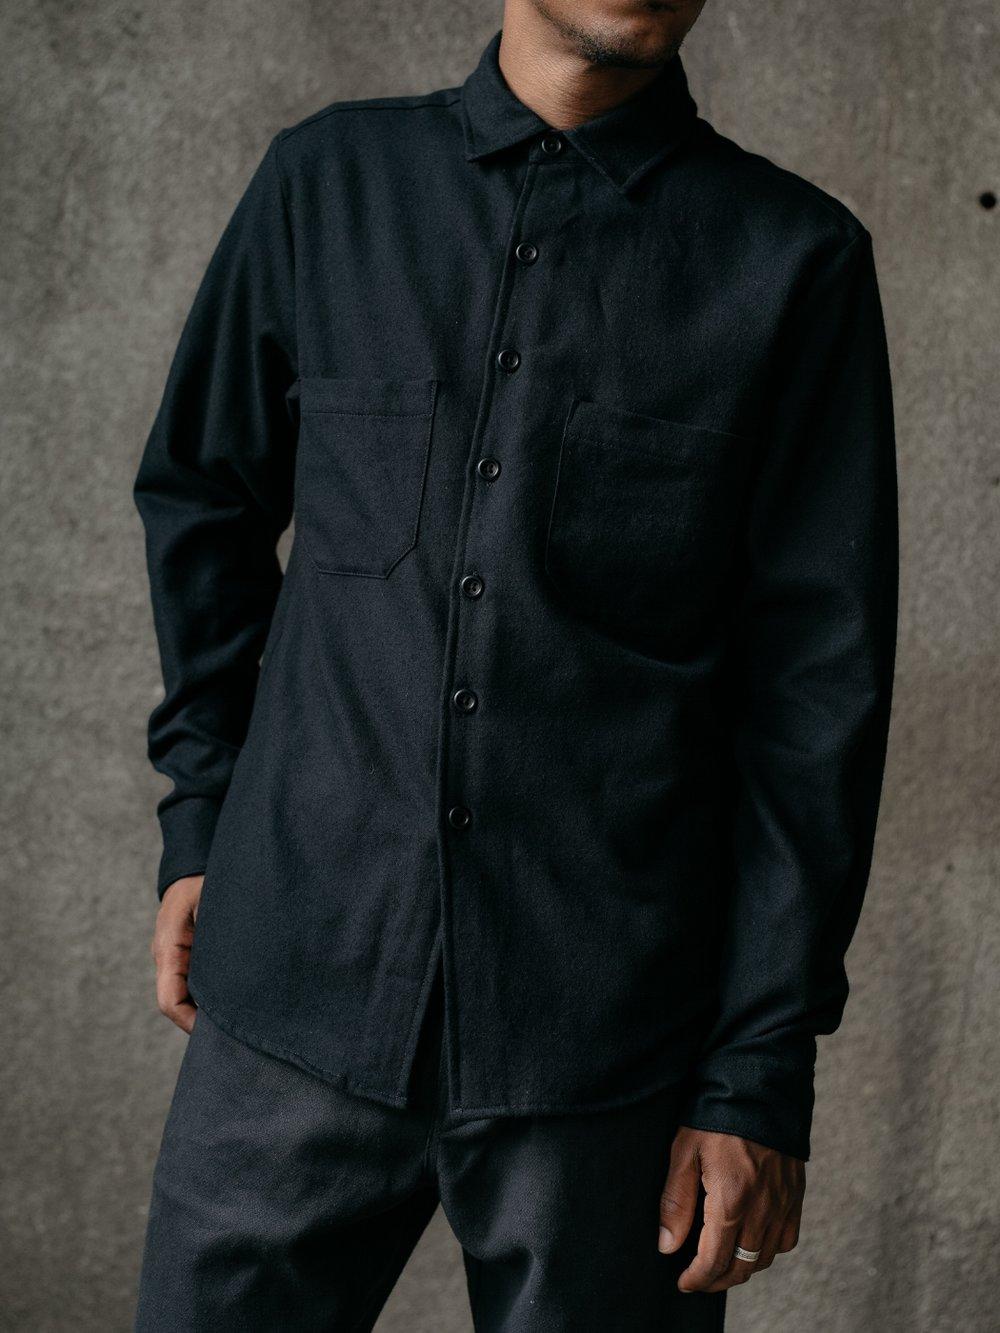 evan-kinori-two-pocket-shirt-navy-wool-cotton-flannel-fall-2017